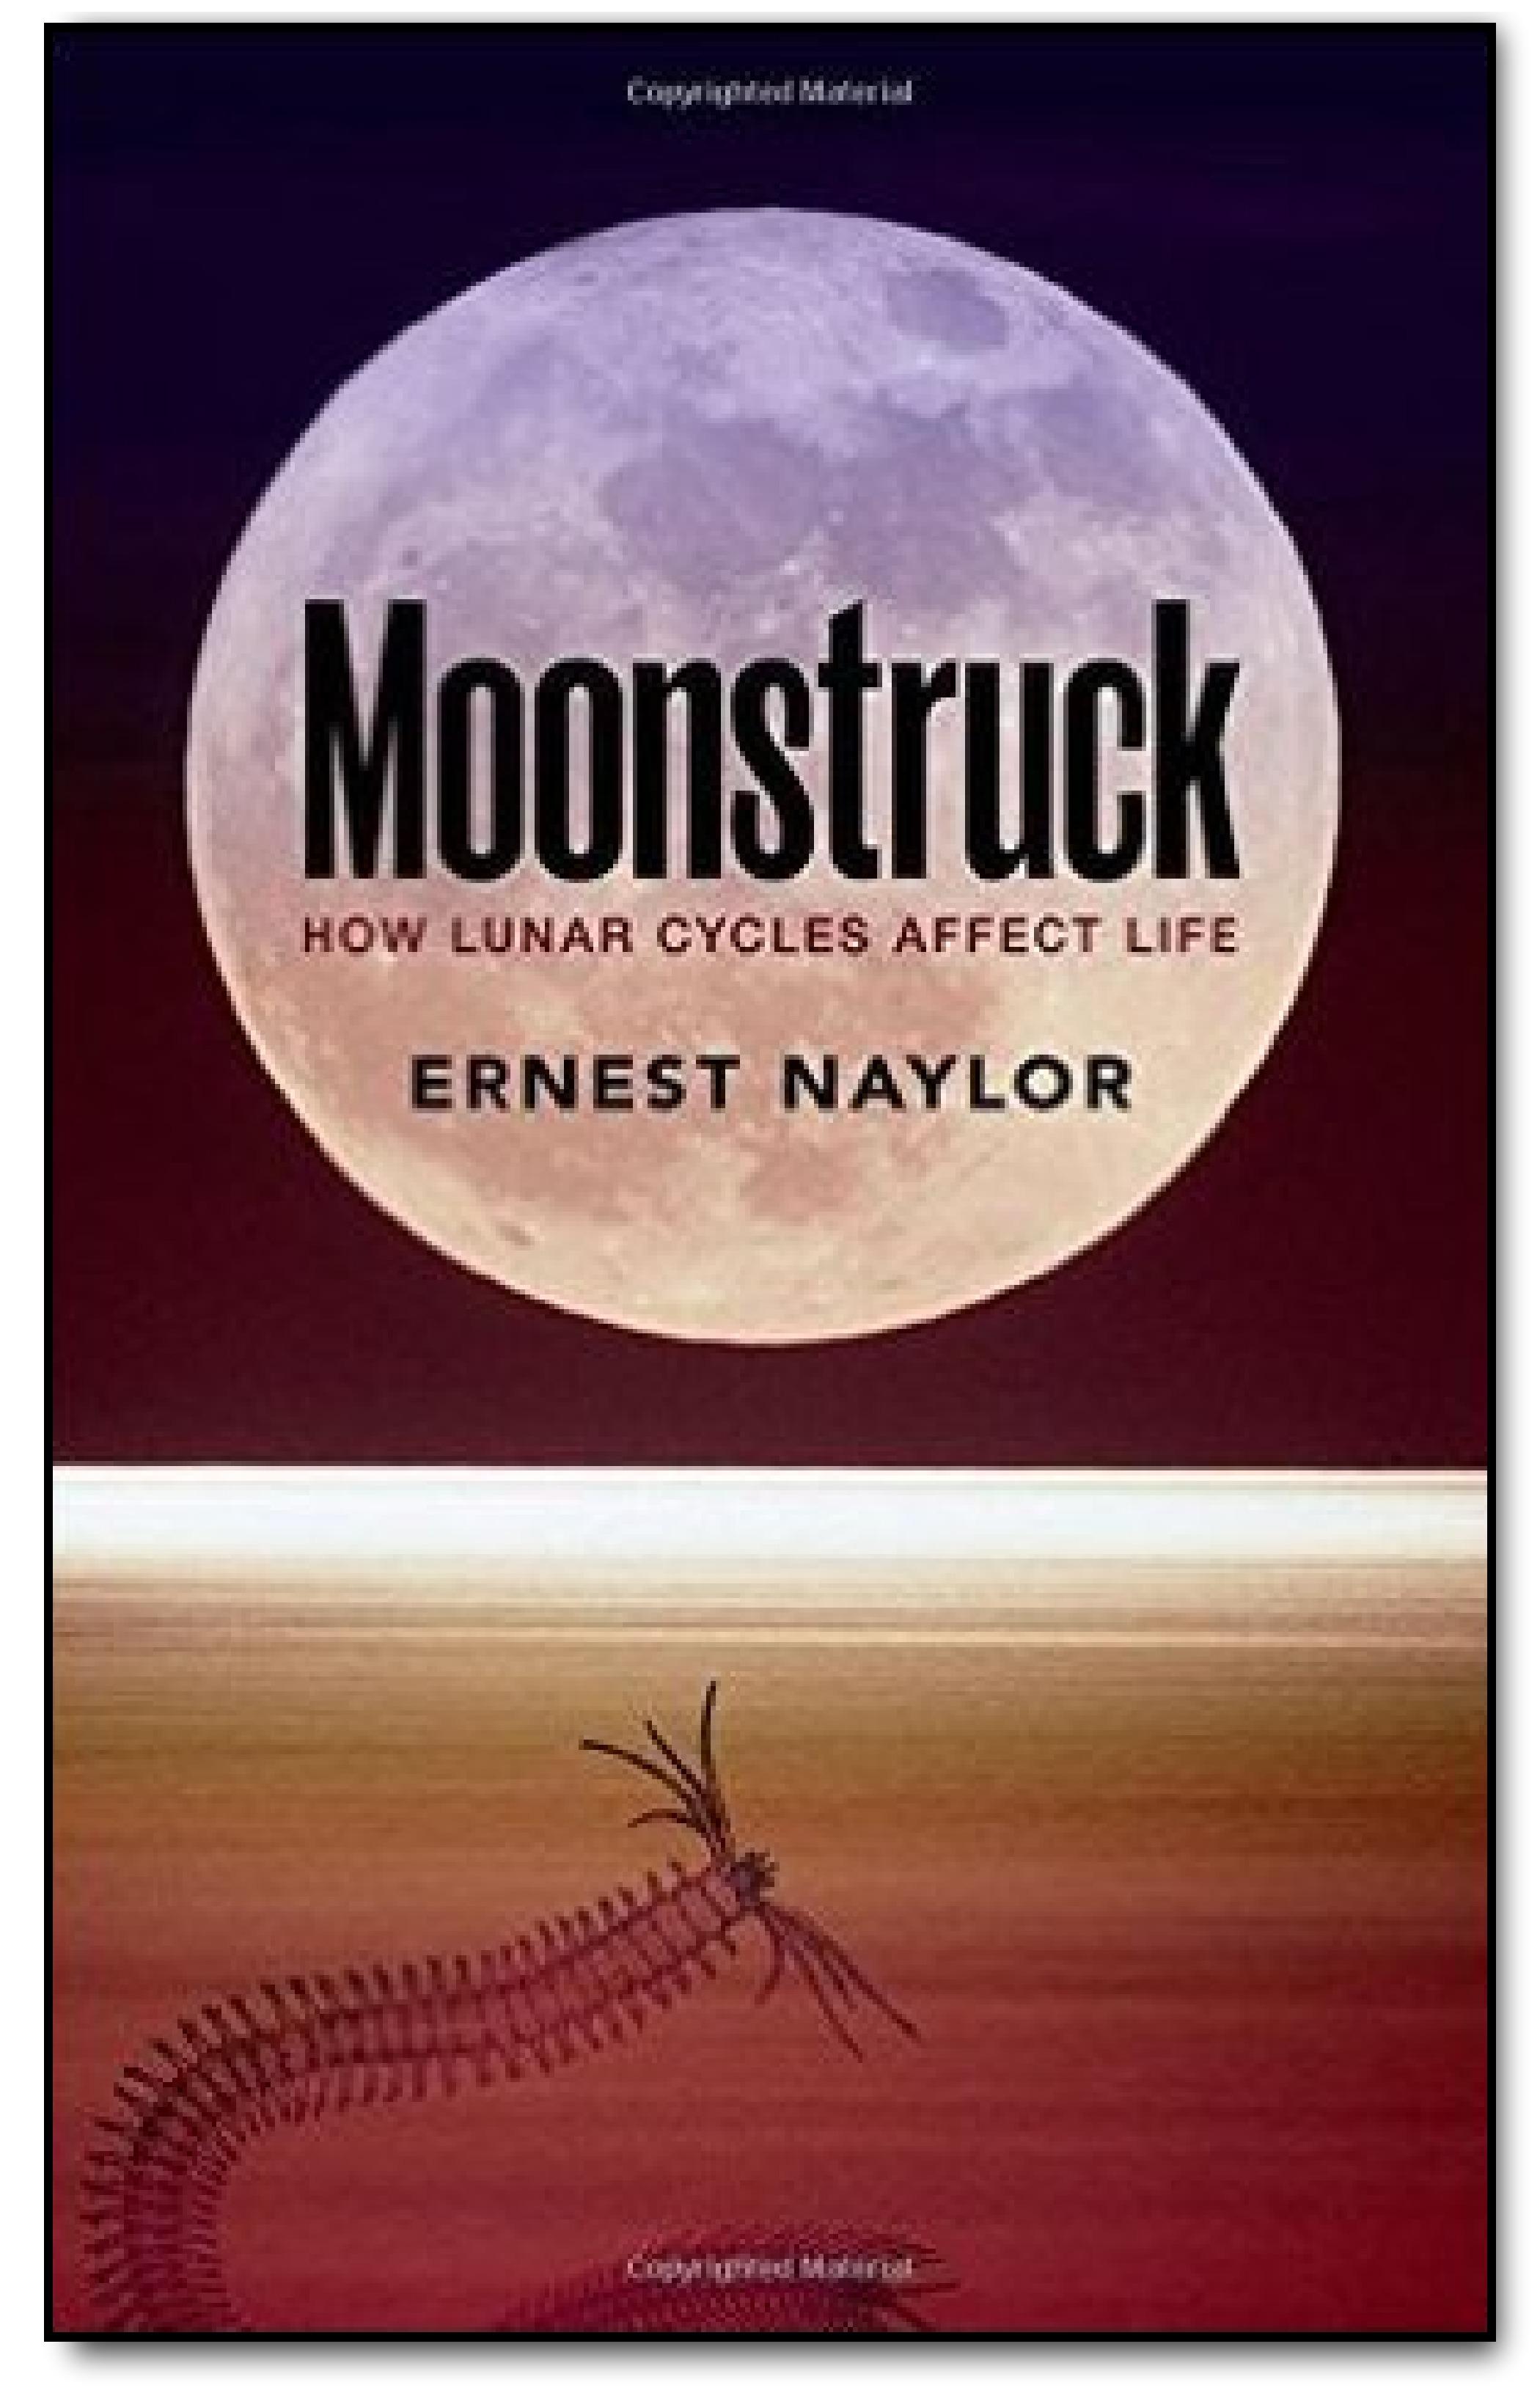 Ernest Naylor: Moonstruck, How Lunar Cycles Affect Life